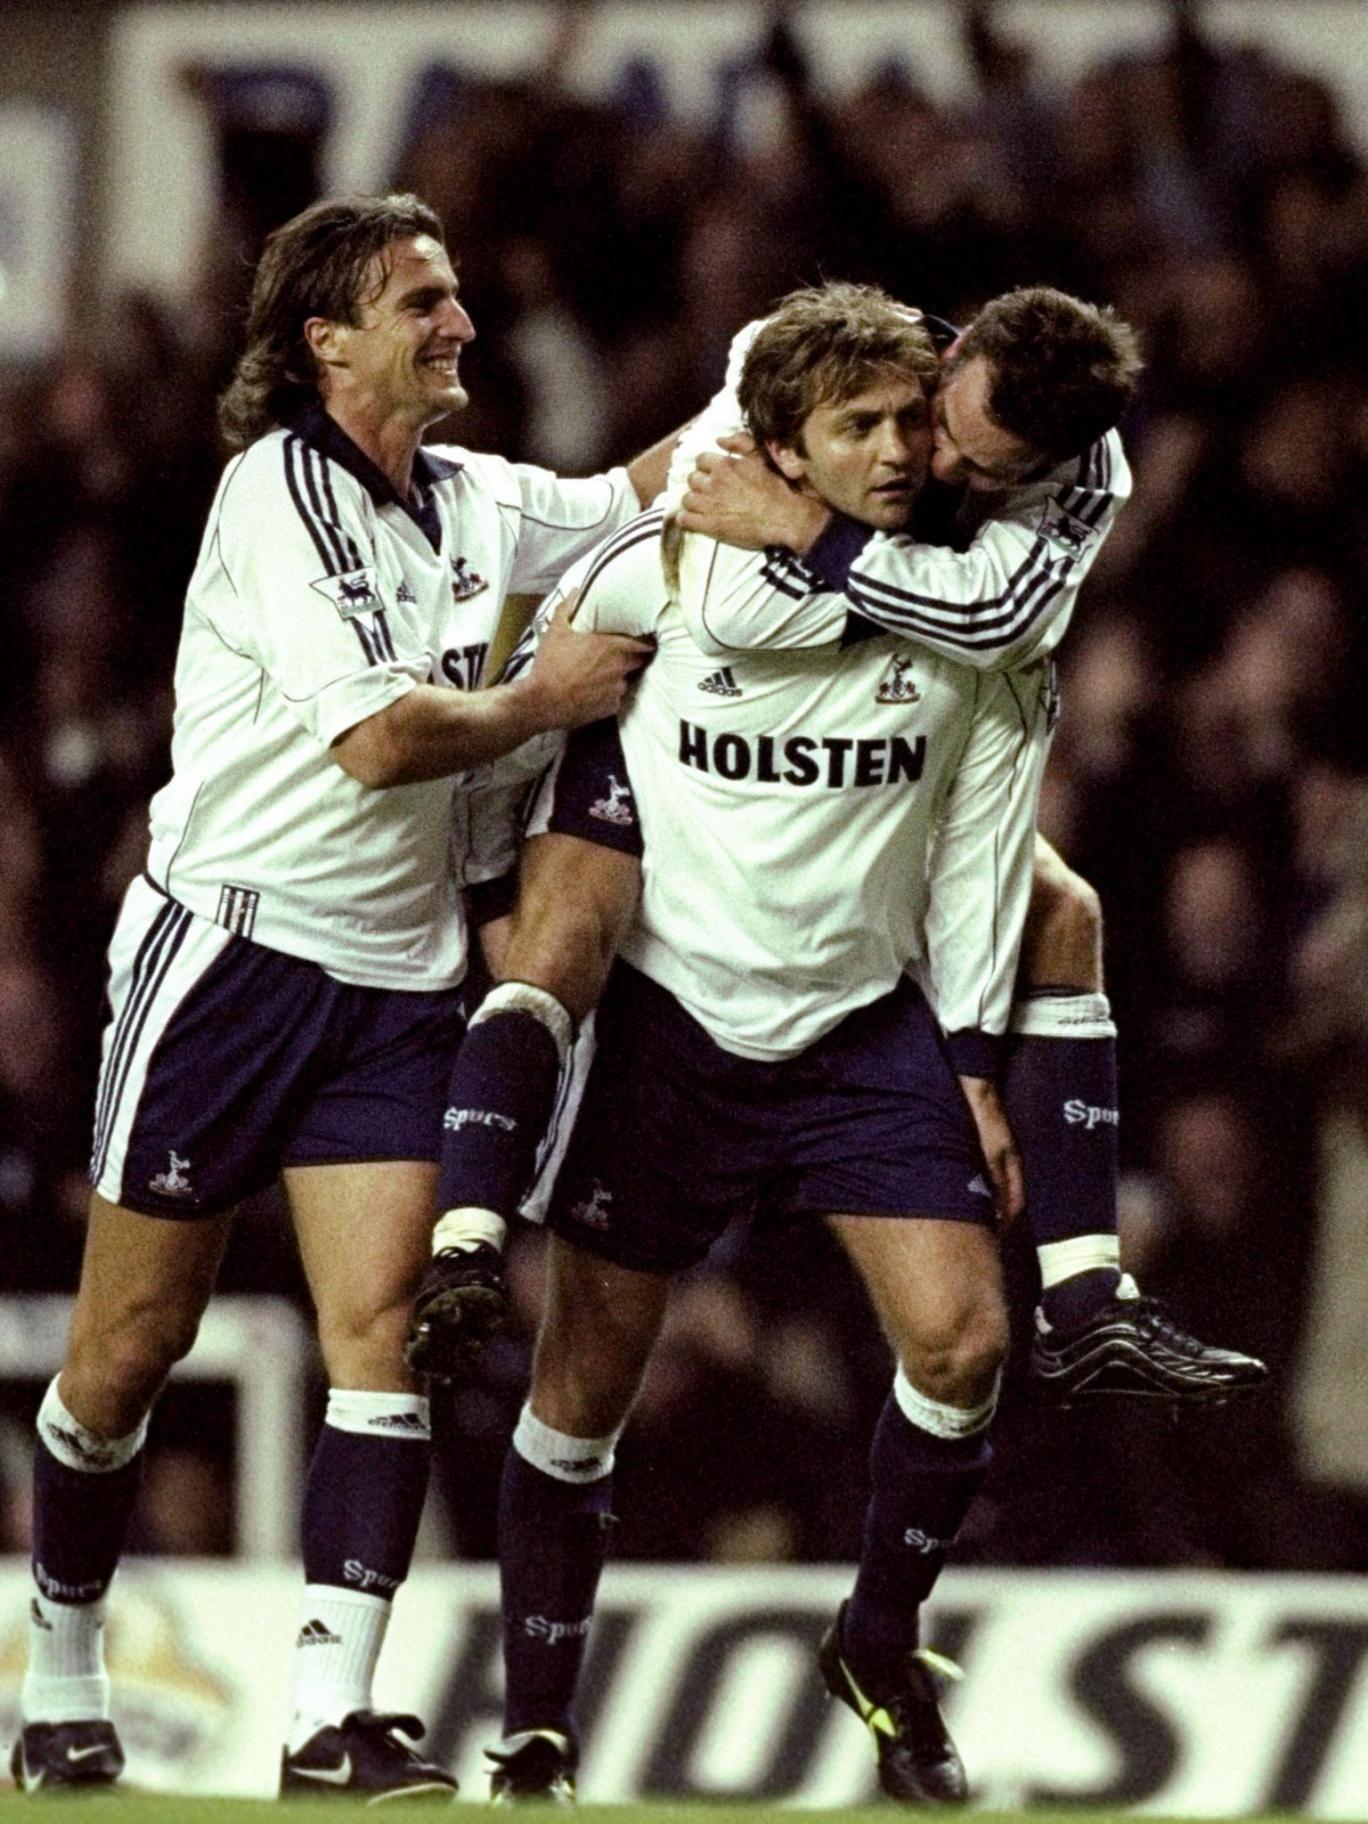 Tim Sherwood celebrates scoring for Spurs in a fiery derby win over Arsenal in 1999